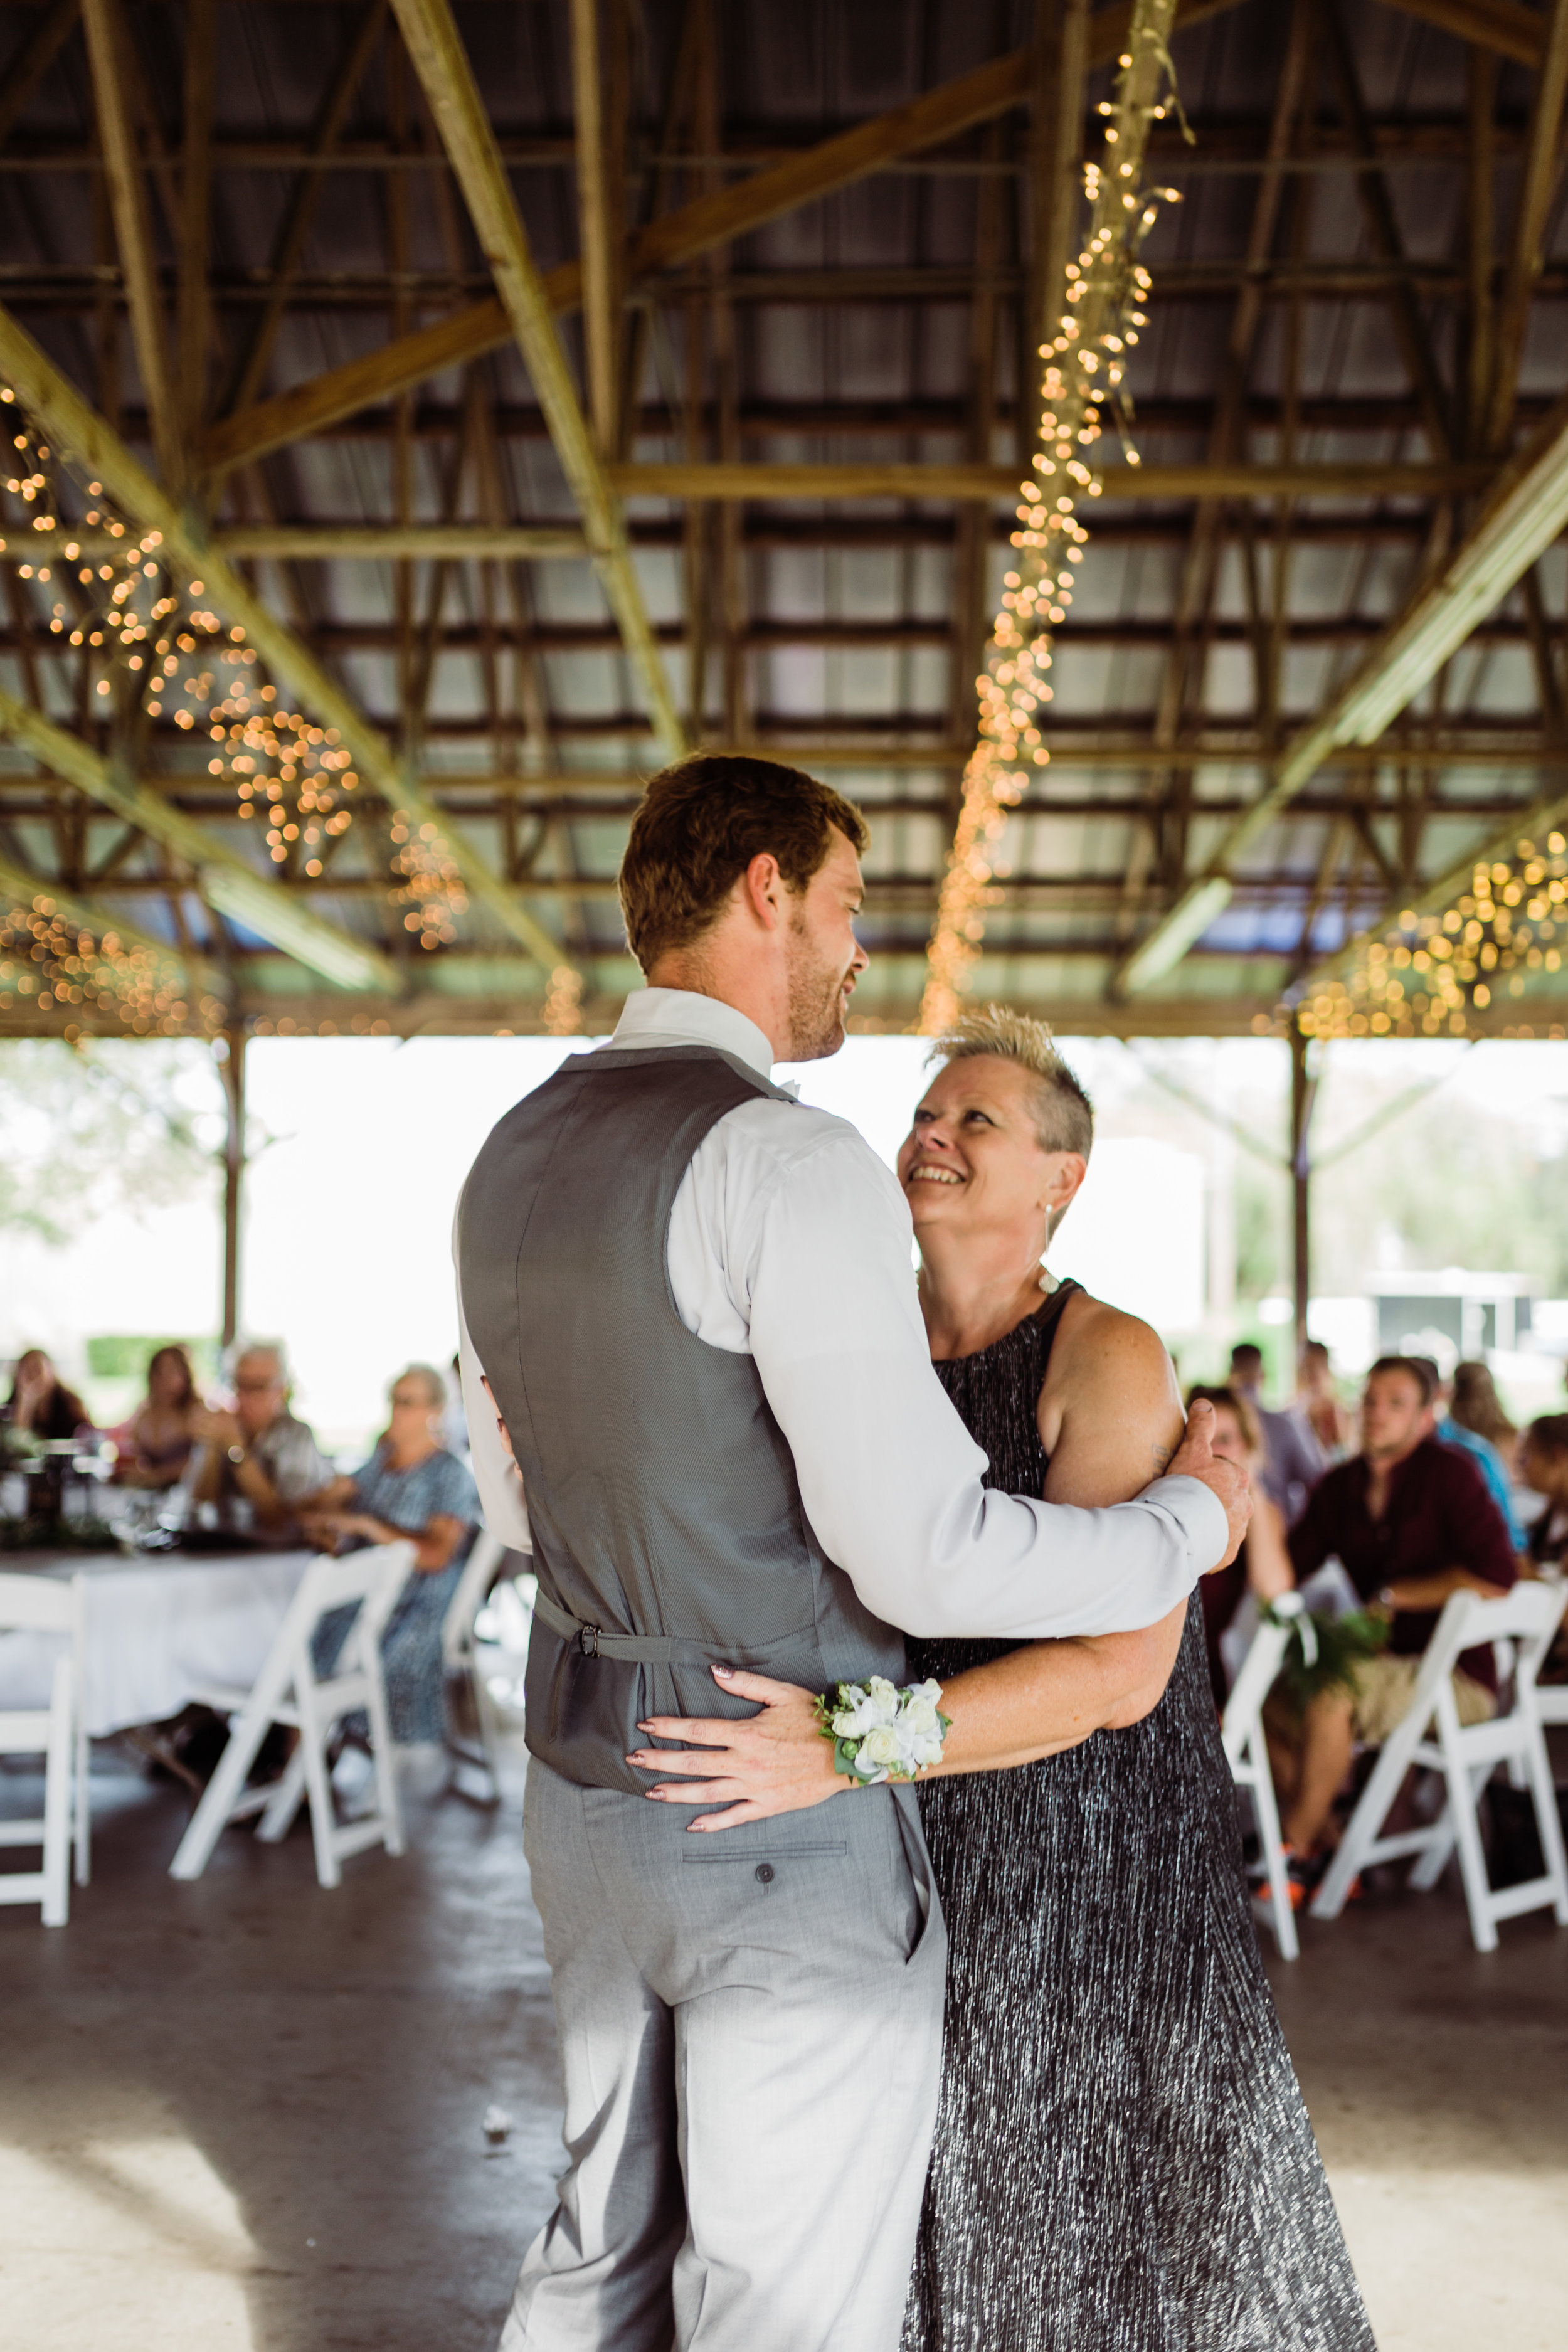 2017.10.14 Samantha and Matthew Crabtree Sarasota Wedding (479 of 708).jpg